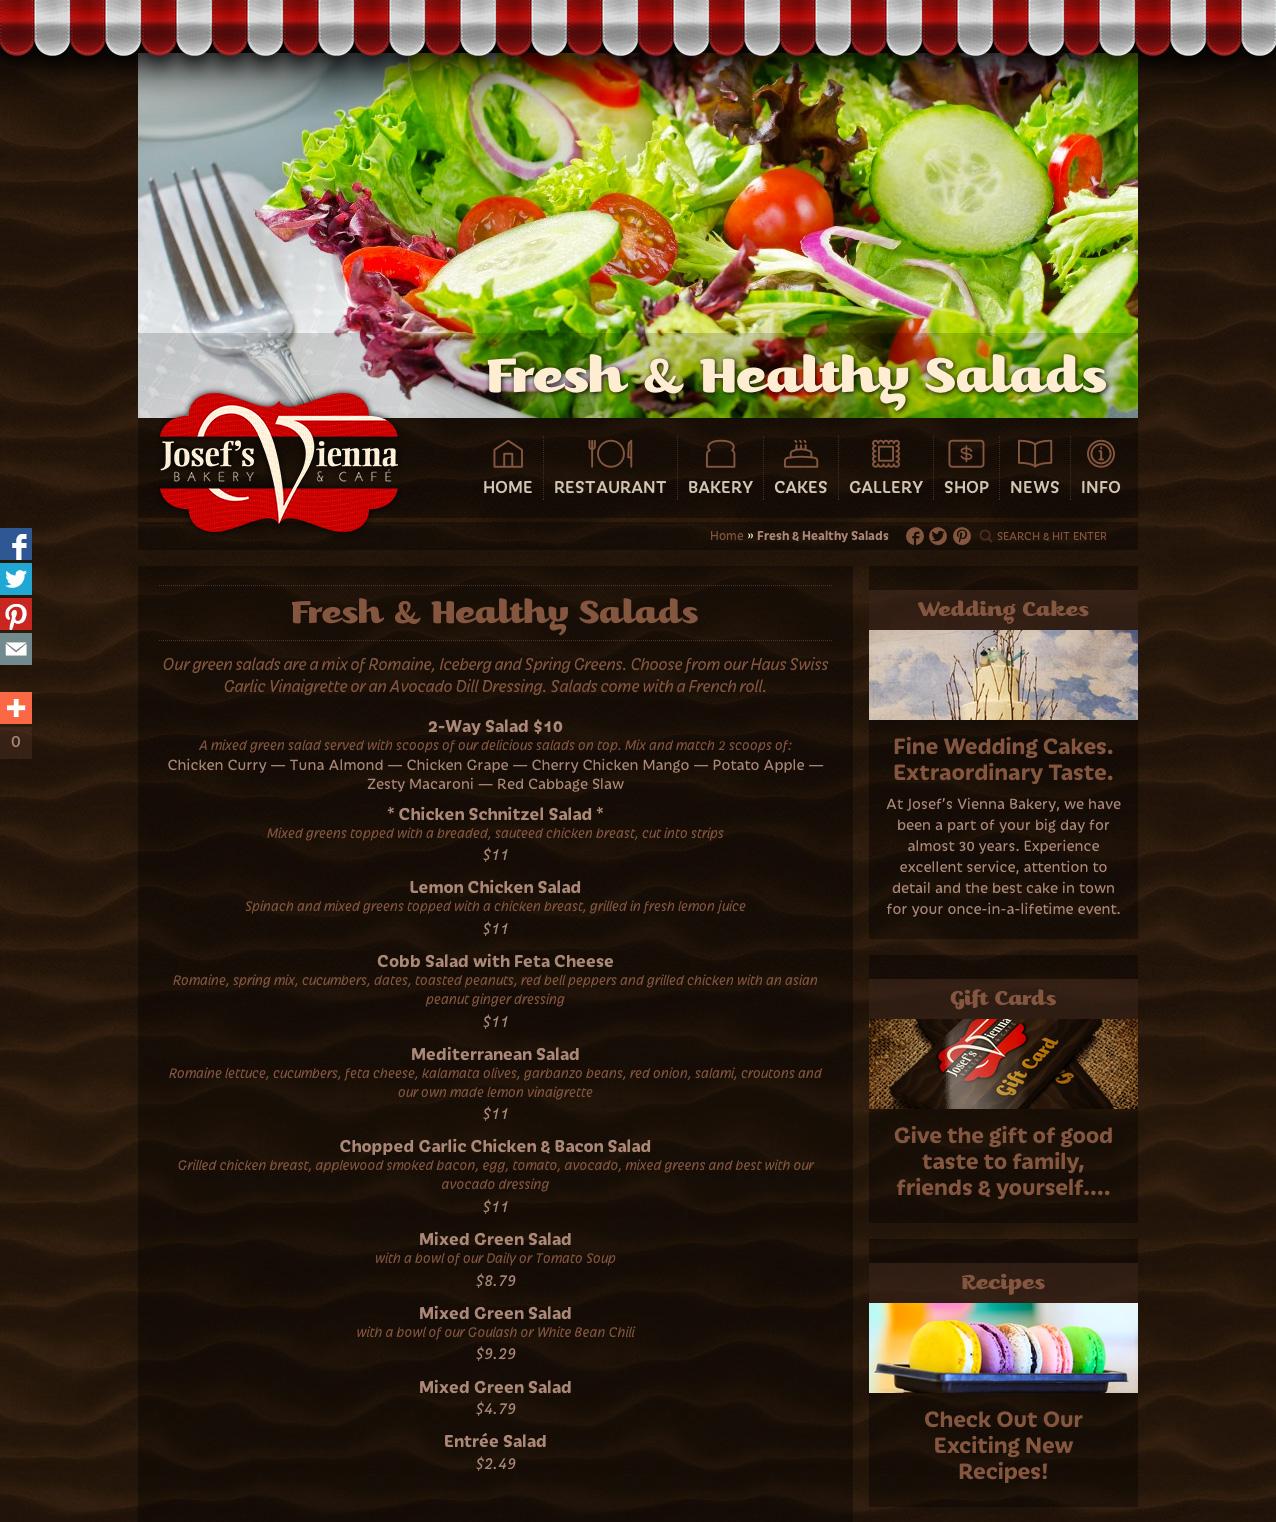 JosefsVienna-Salads